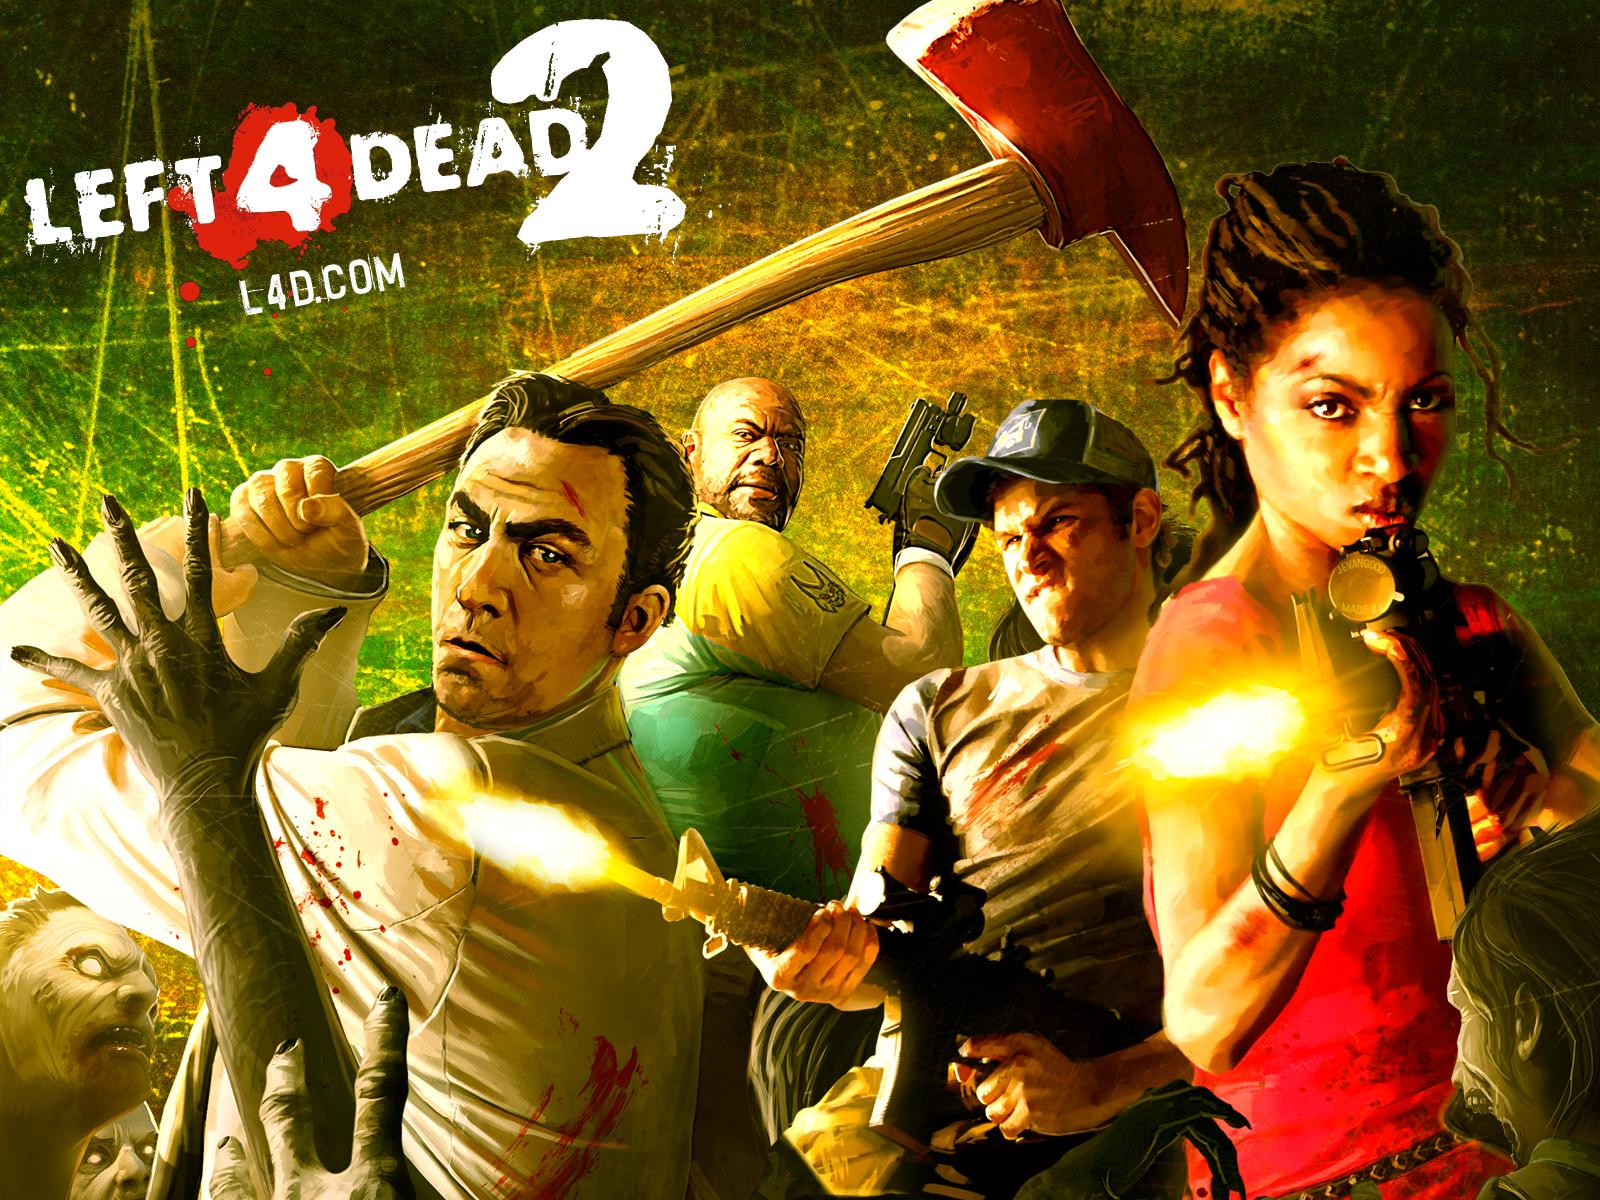 Games\left 4 dead 2\) Установите самый актуальный Left 4 Dead 2 кряк